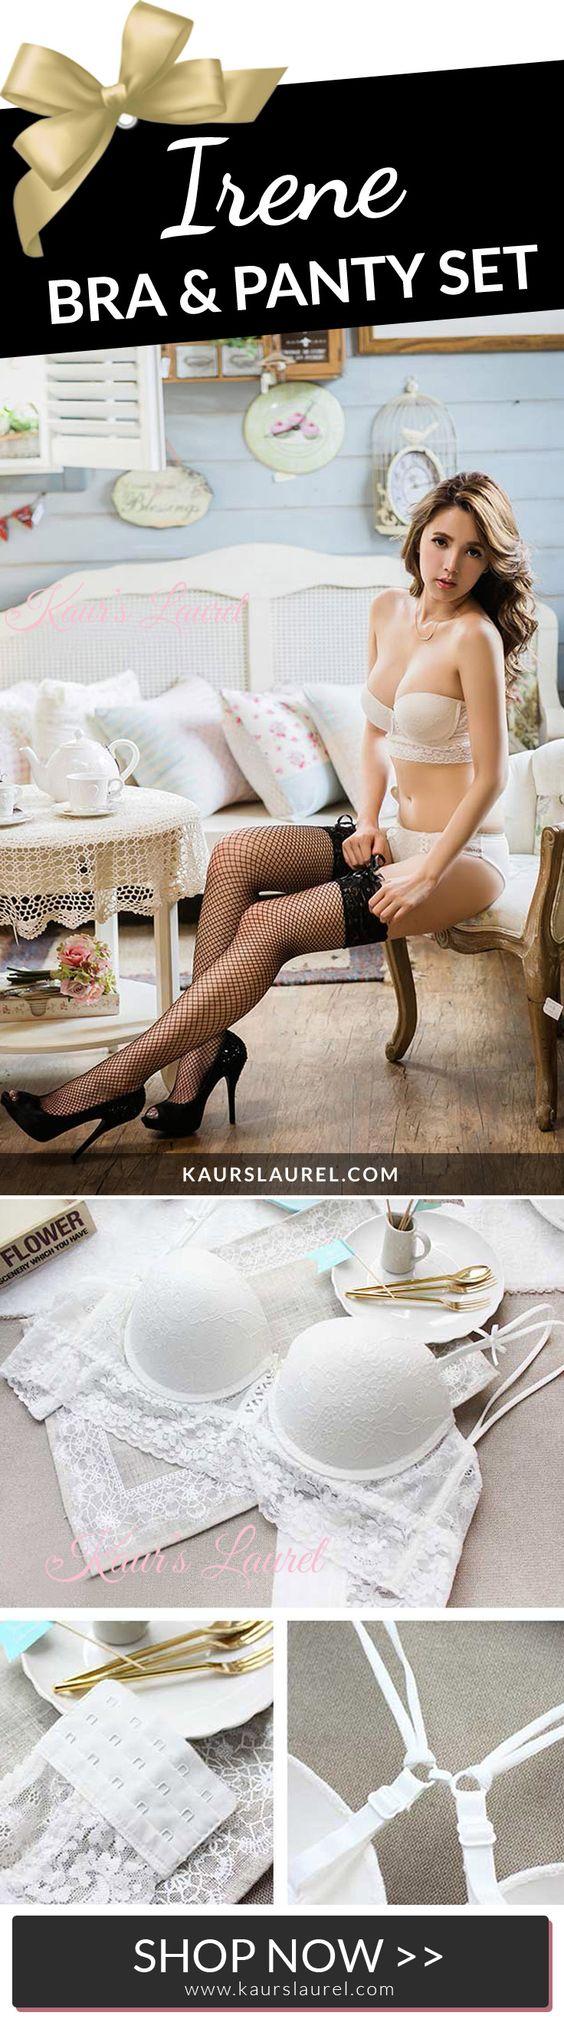 Beautiful Irene lace bra & brief set in white by Kaur's Laurel #kawaii #lingerie | SHOP >> http://www.kaurslaurel.com/products/irene-longline-bra-white